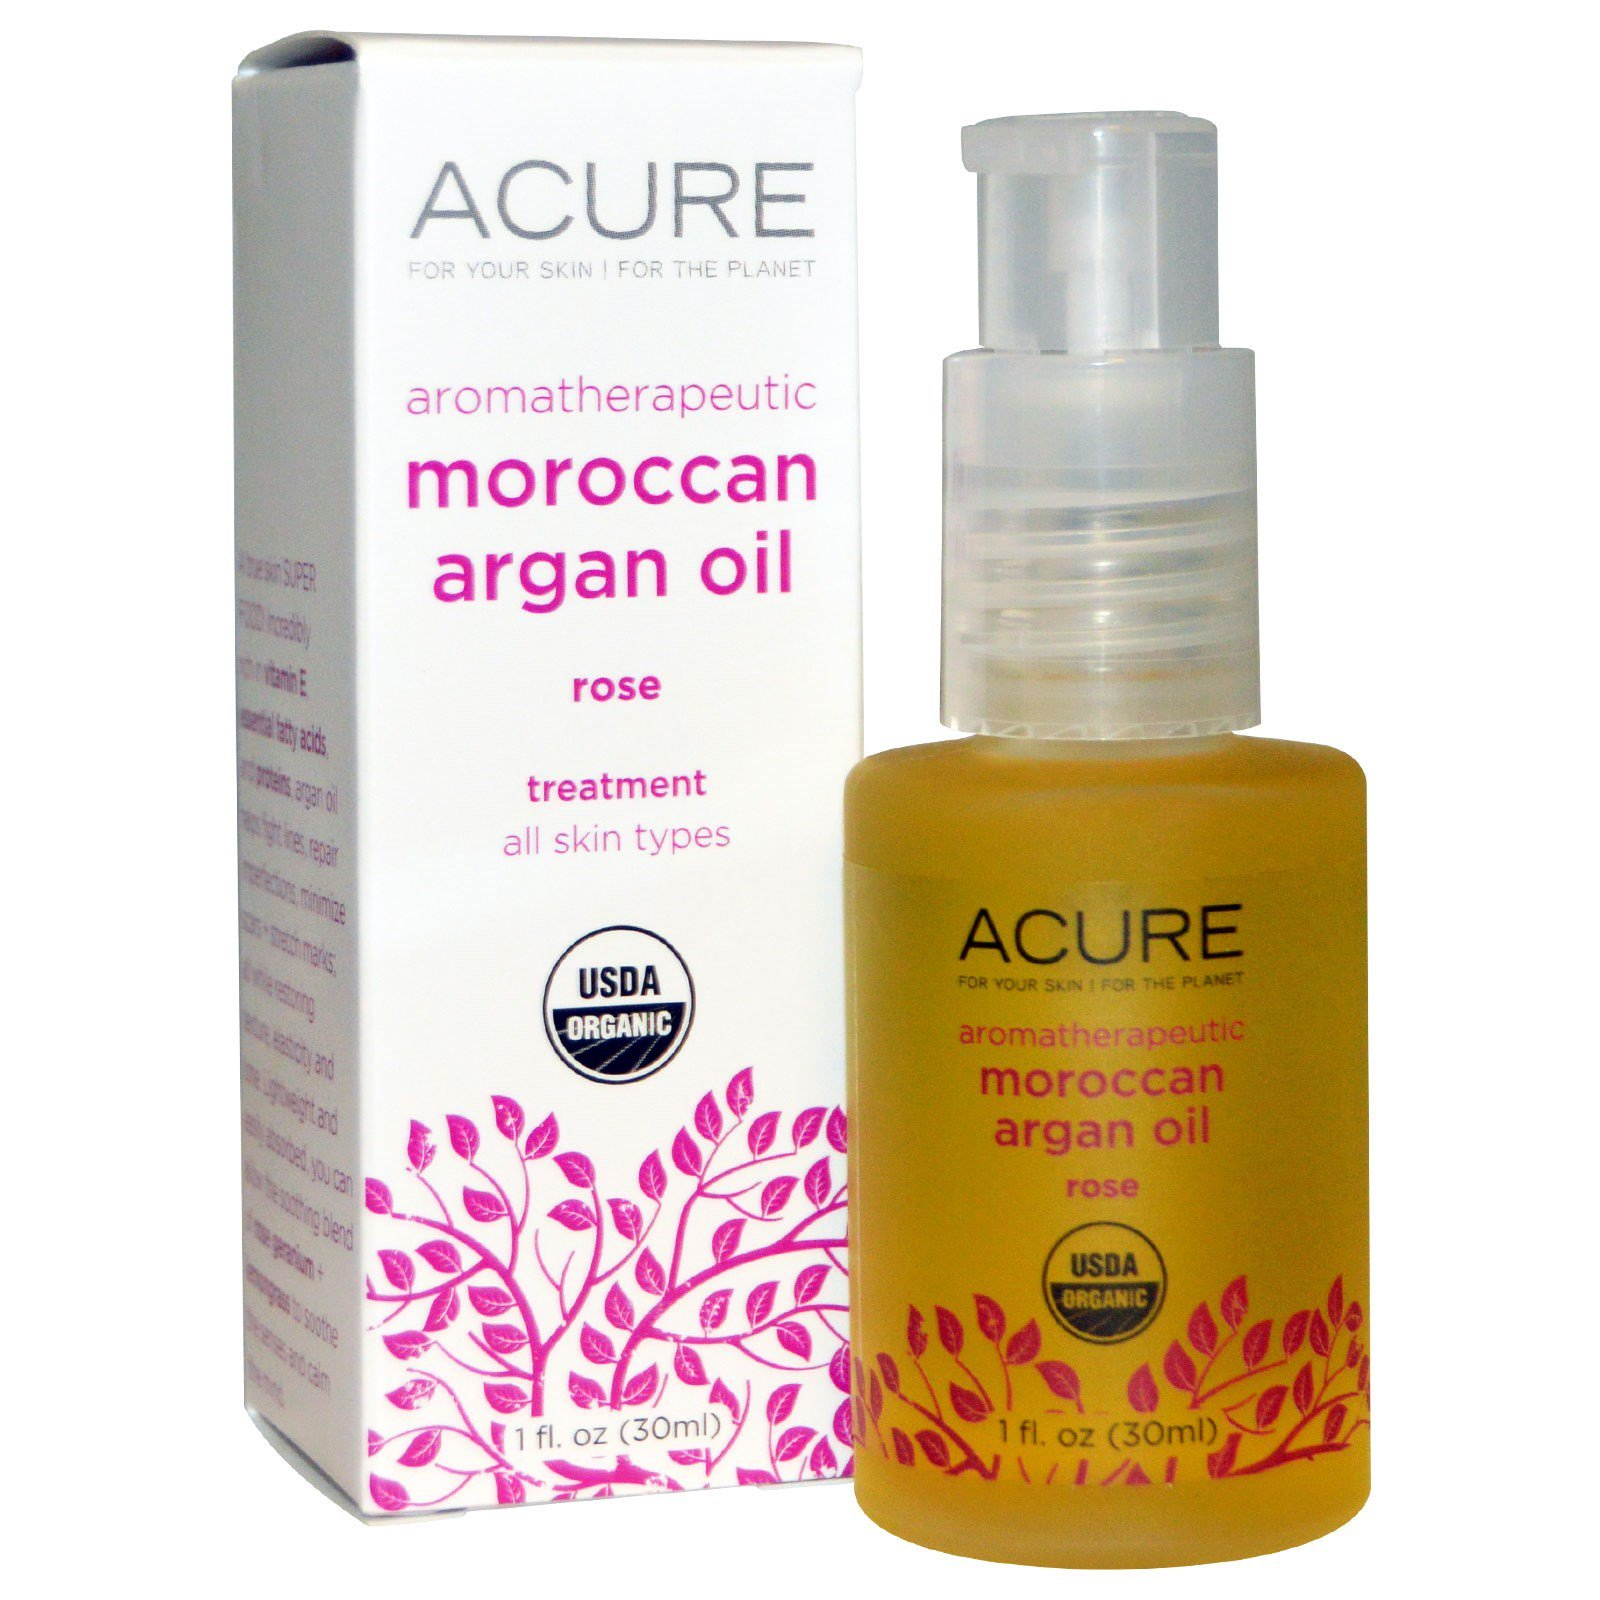 Acure Organics, Aromatherapeutic Moroccan Argan Oil, Rose